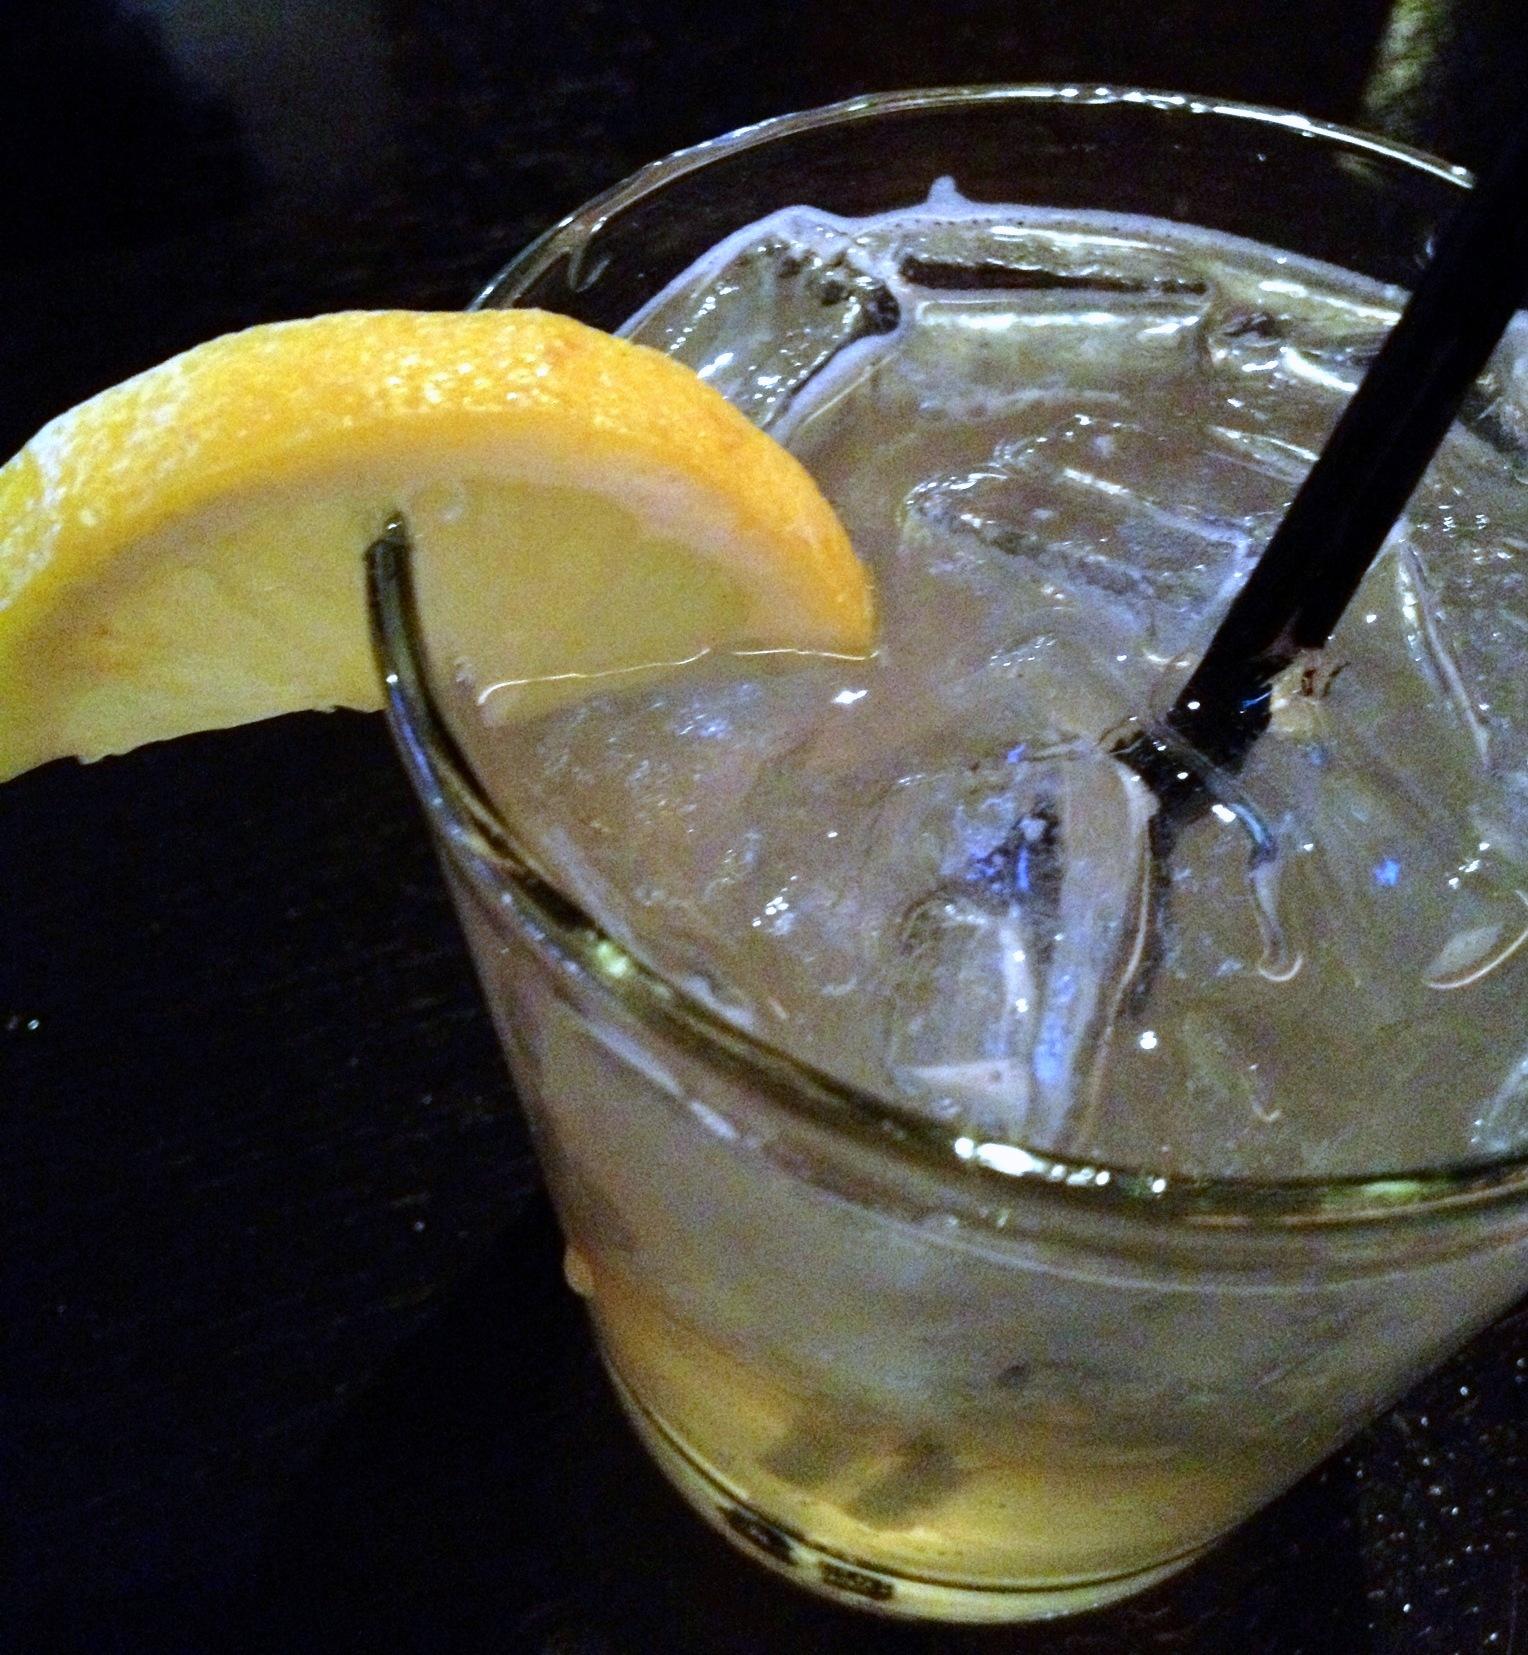 St. BHT cocktail